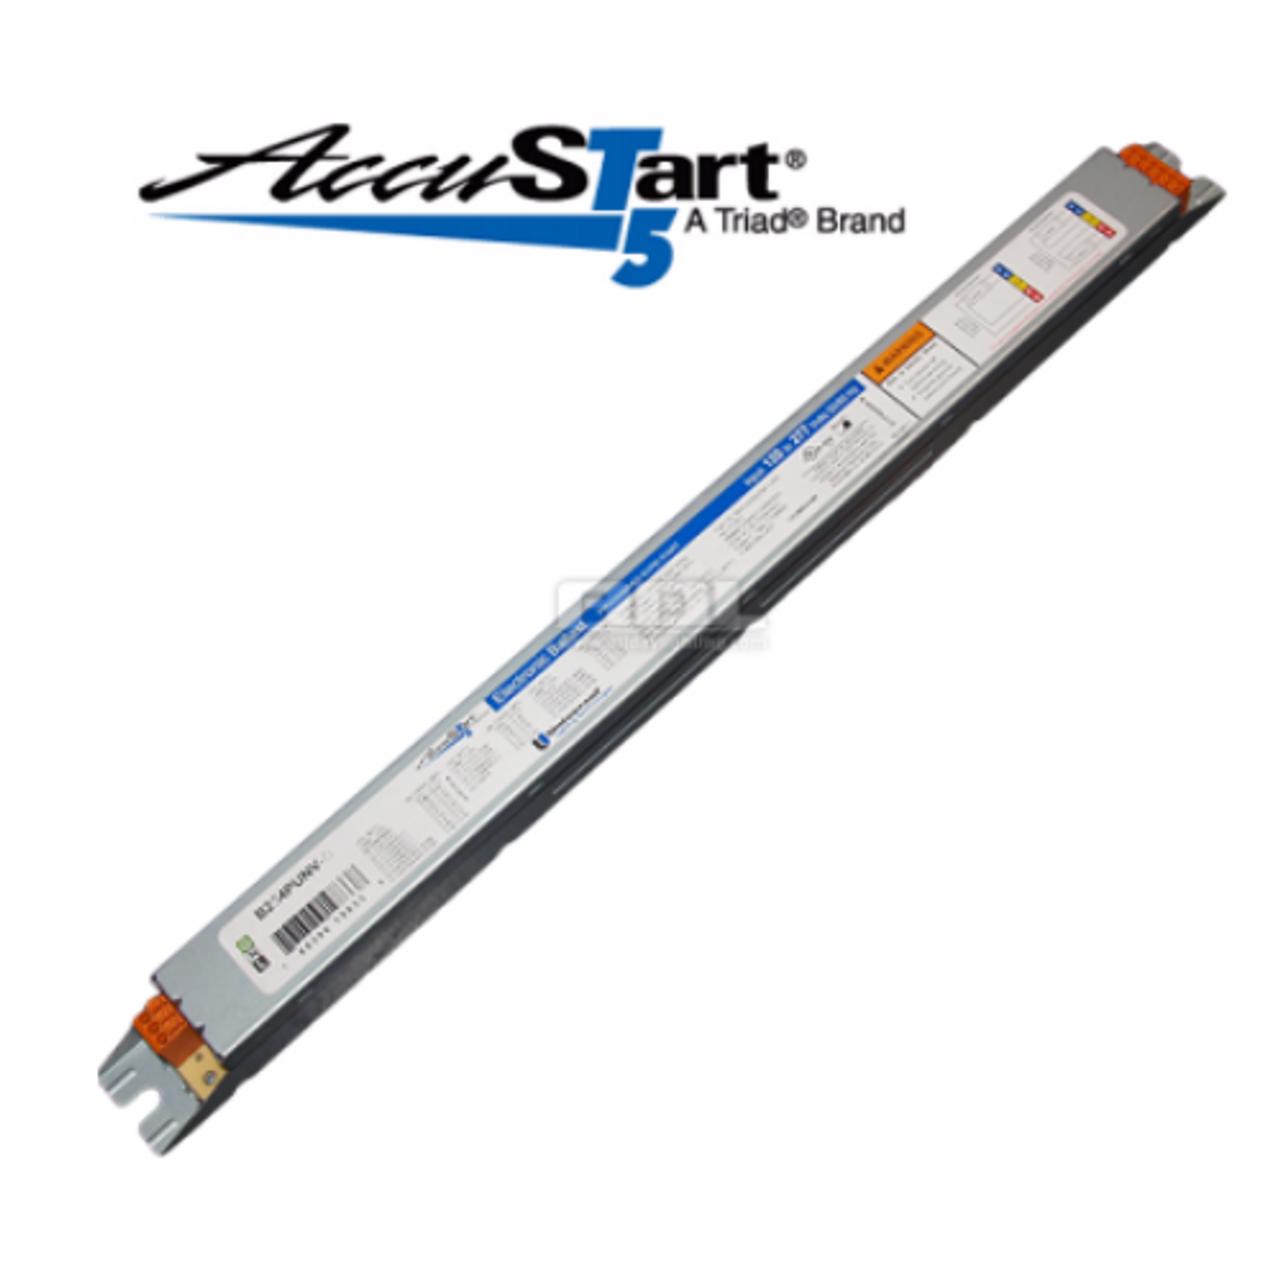 28W T5 2 LAMP UNIVERSAL B228PUNV-C ELECTRONIC FLUORESCENT BALLAST 120//277V